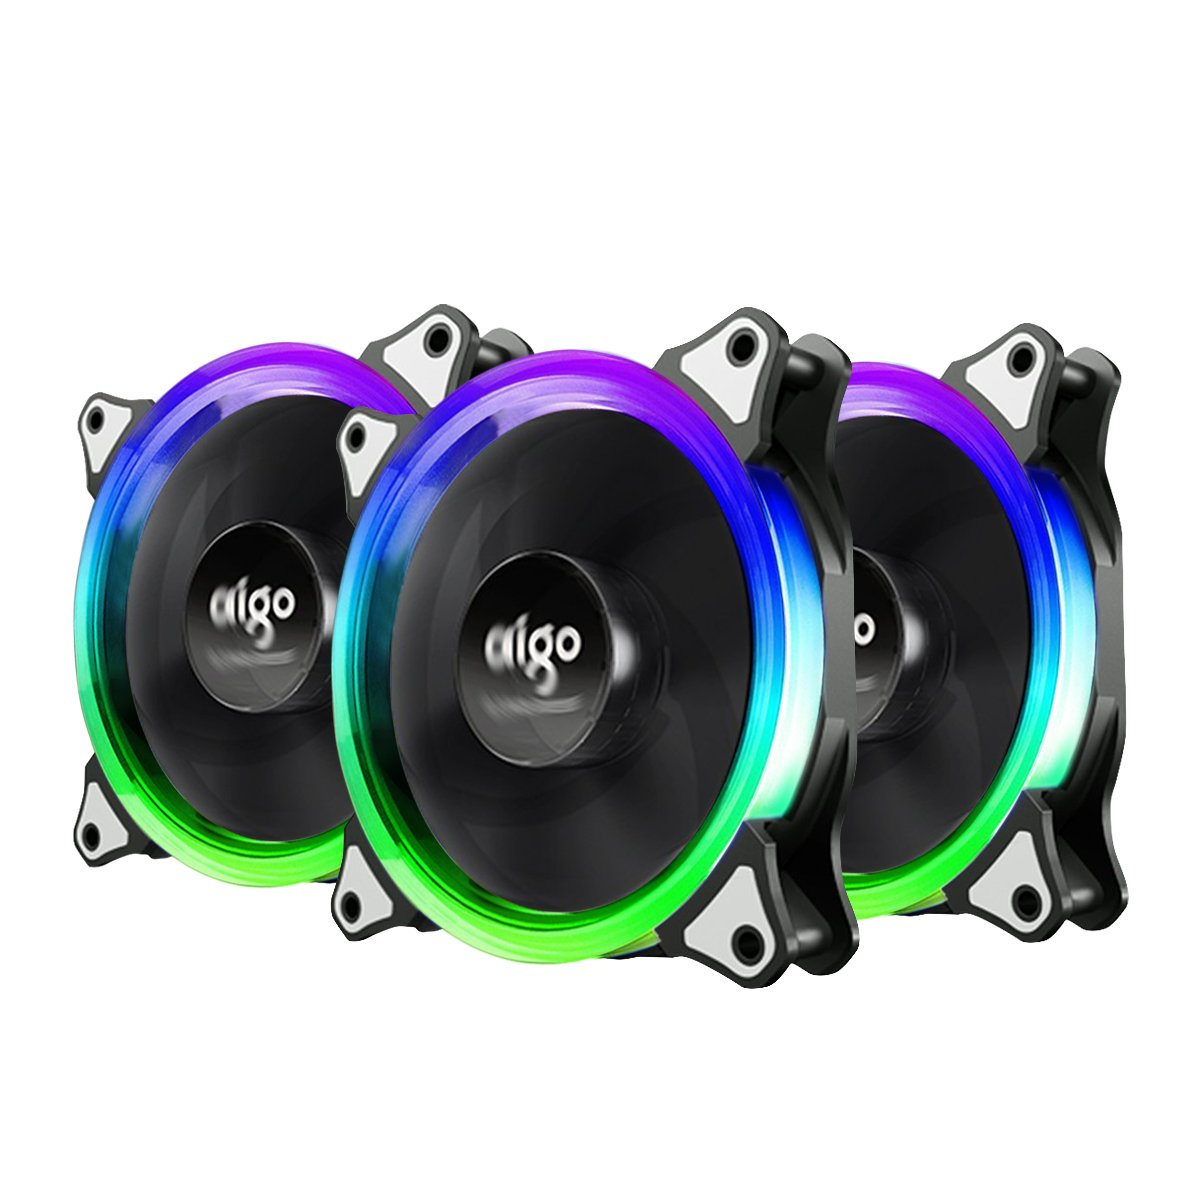 3-Pack Aigo  RGB LED 120mm Quiet Edition Adjustable LED Case Fan for PC Cooler